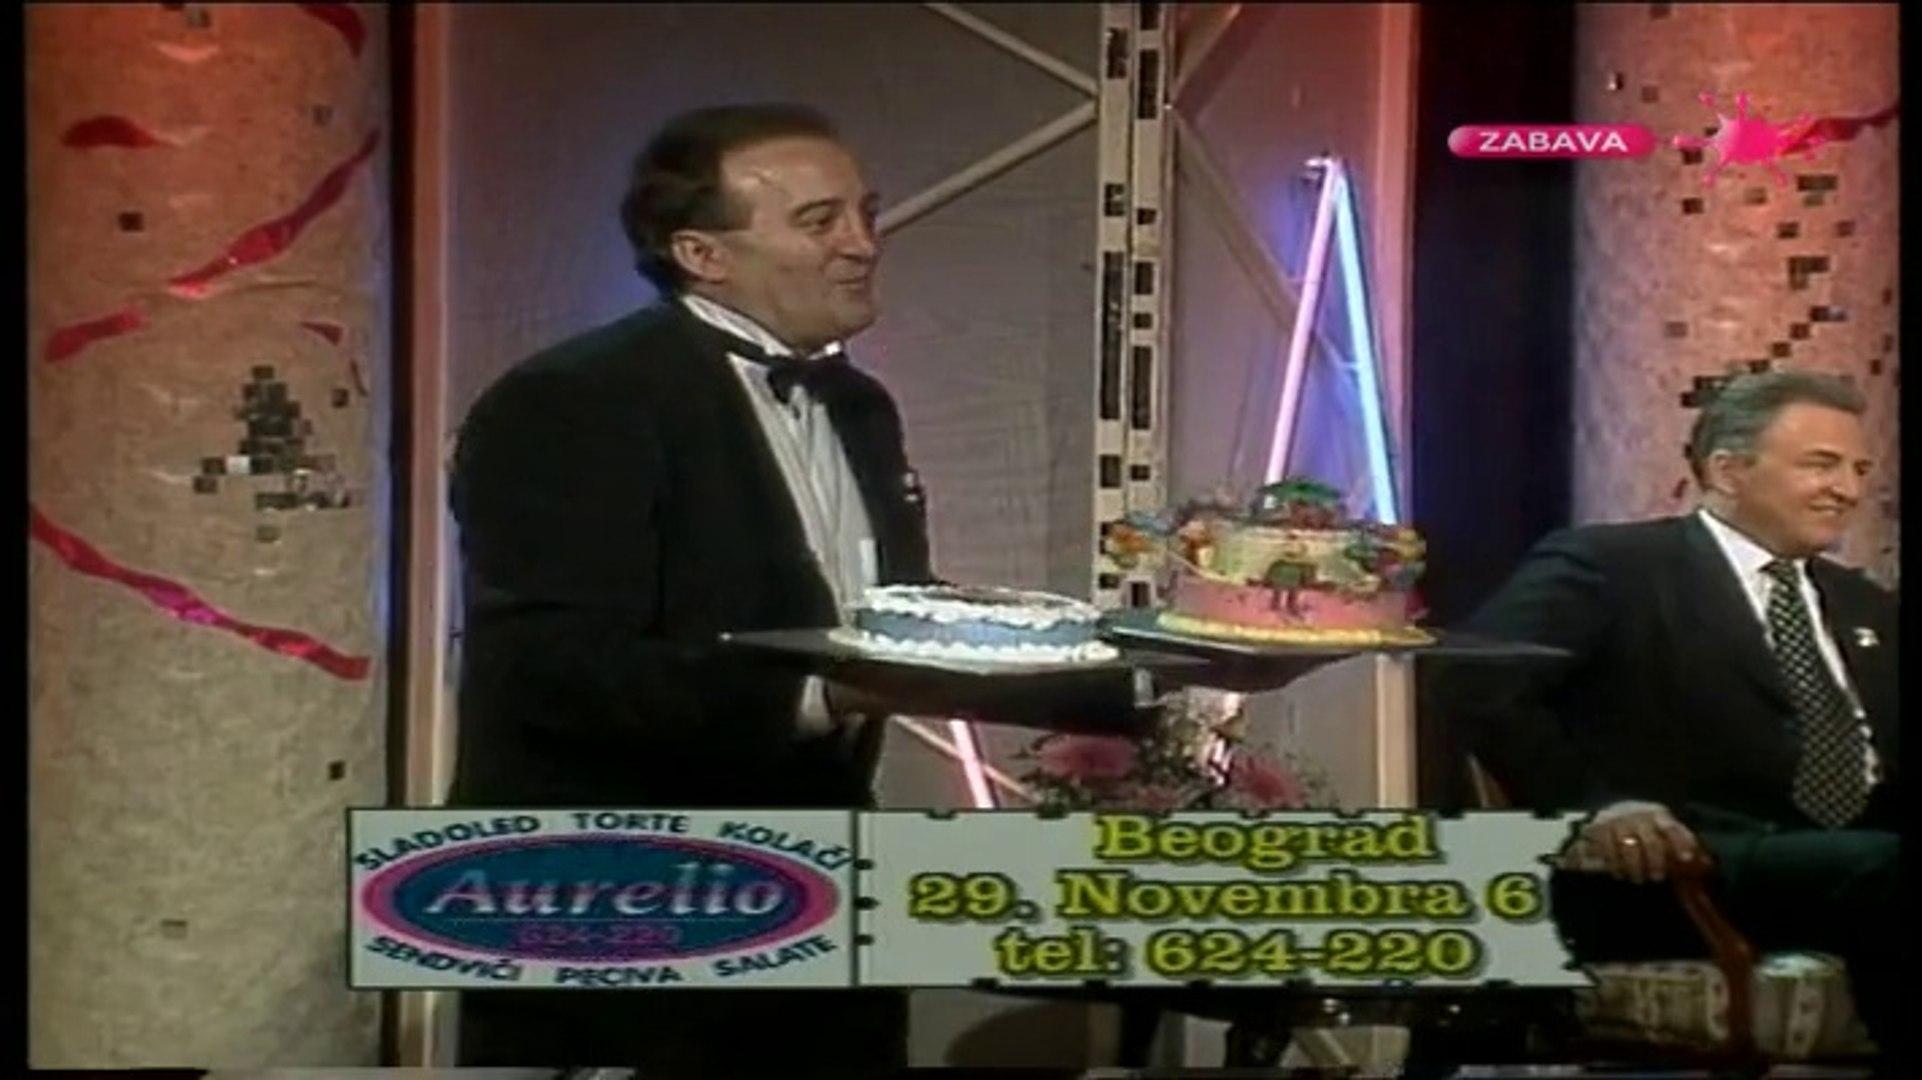 Maksovizija - Arkan, Ivana Zigon i Milic Vukasinovic 1999 (deo 2-2)